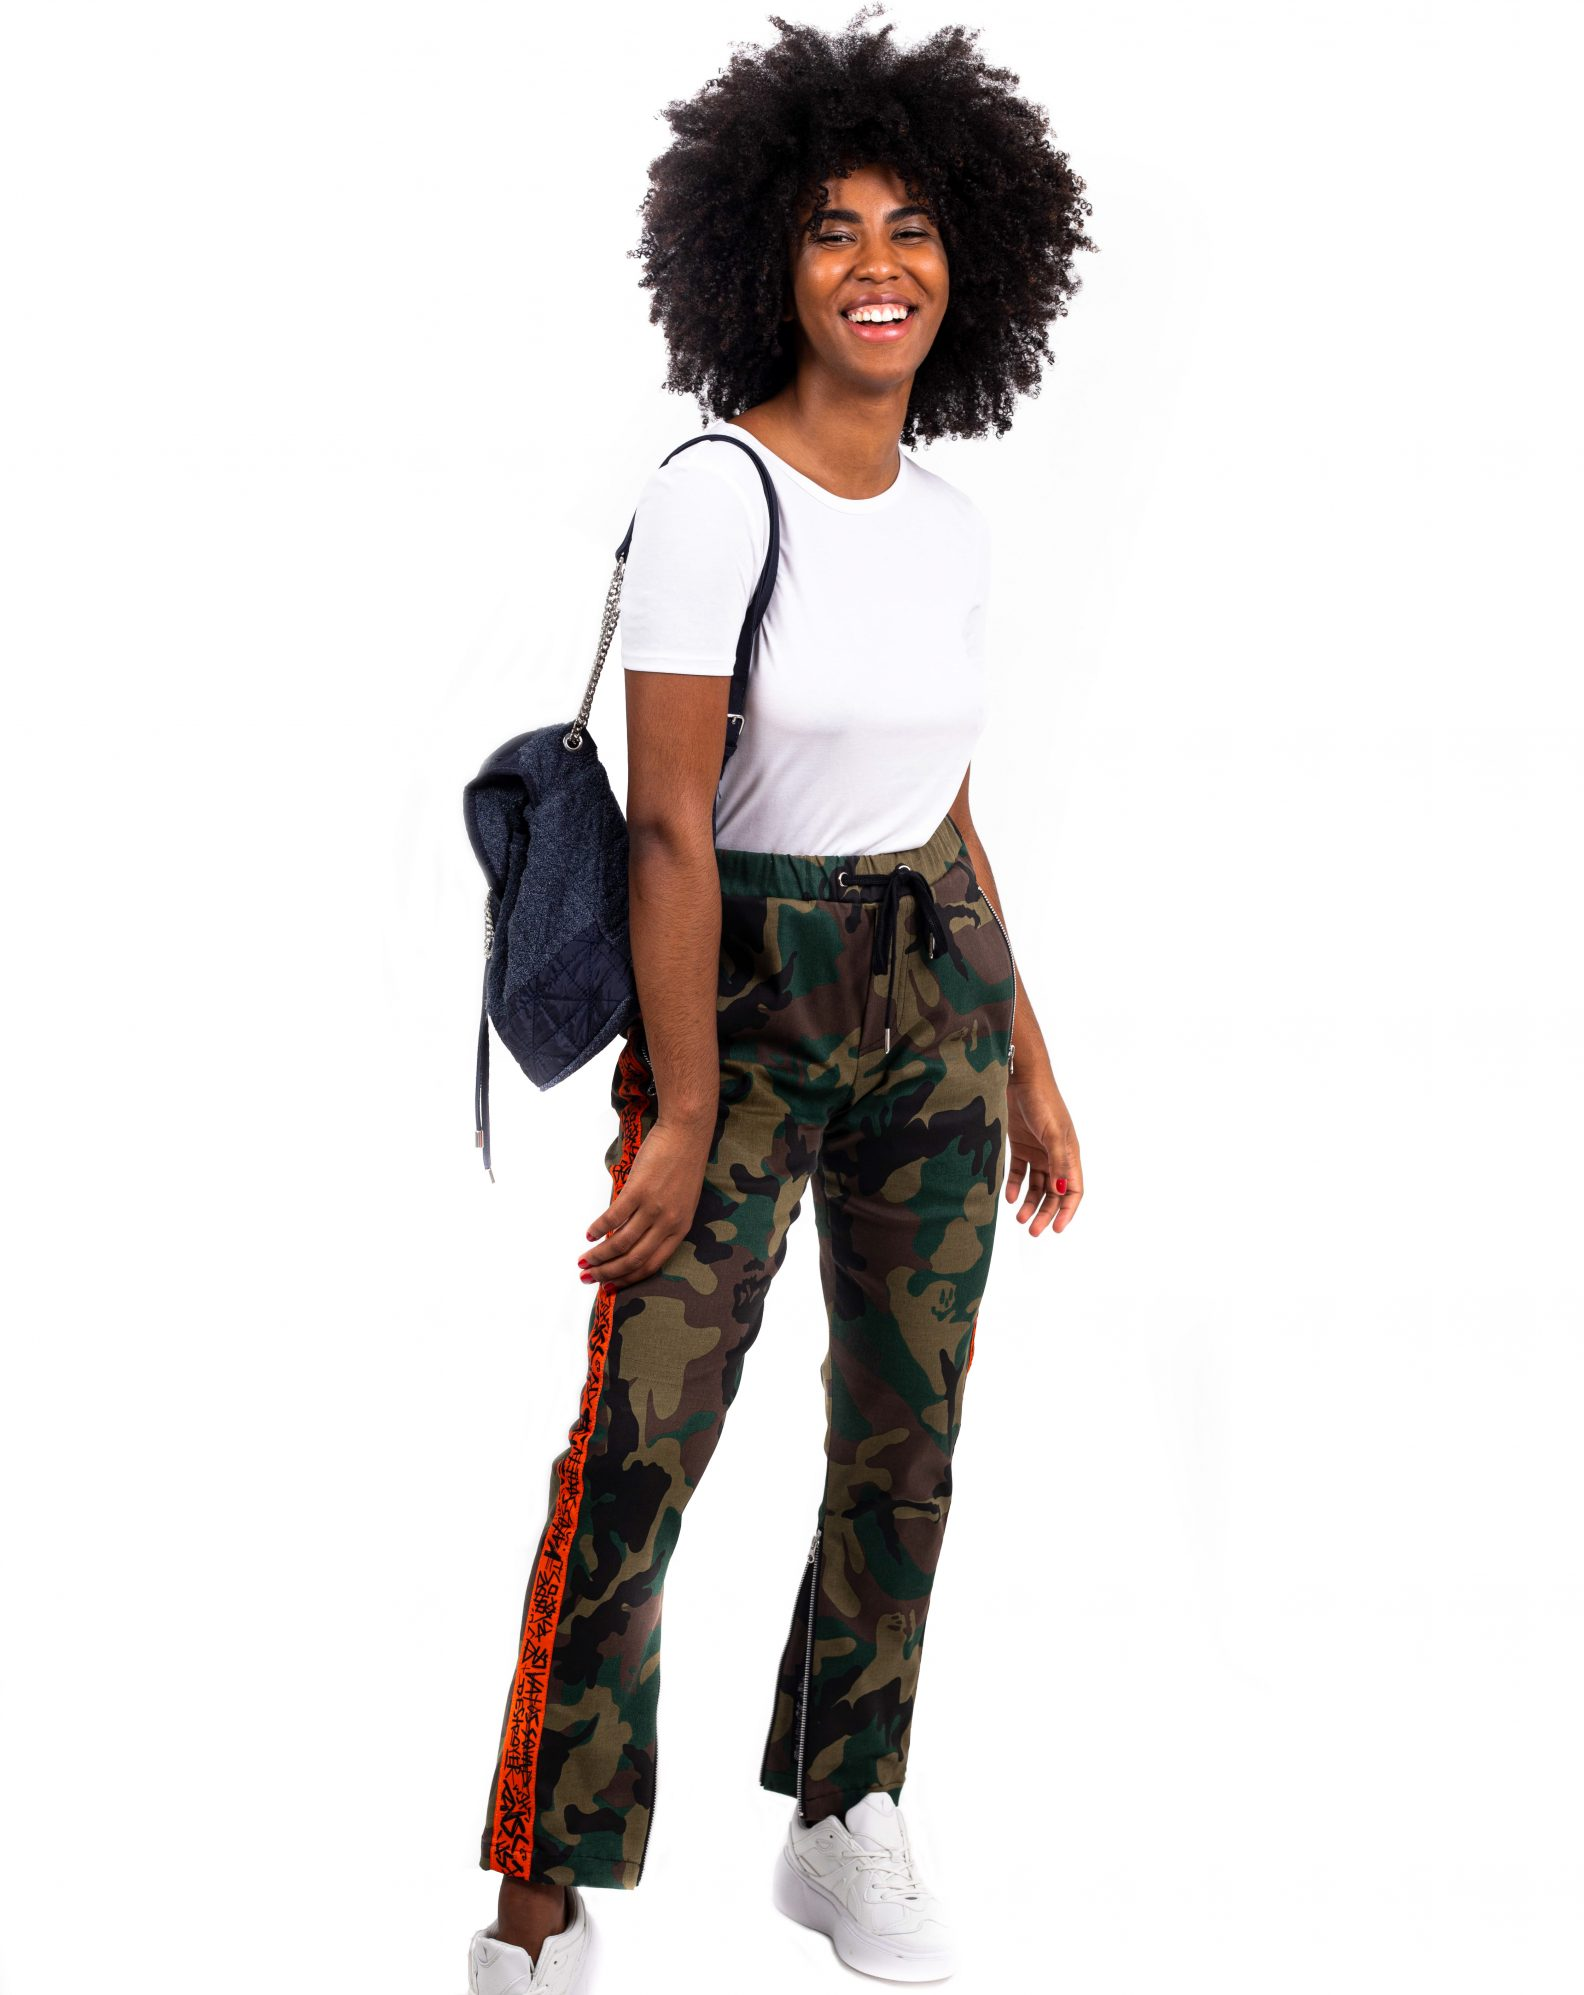 pantalon-sport-camouflage-bande-laterale-stigma-mode-coreenne-affaires-etrangeres